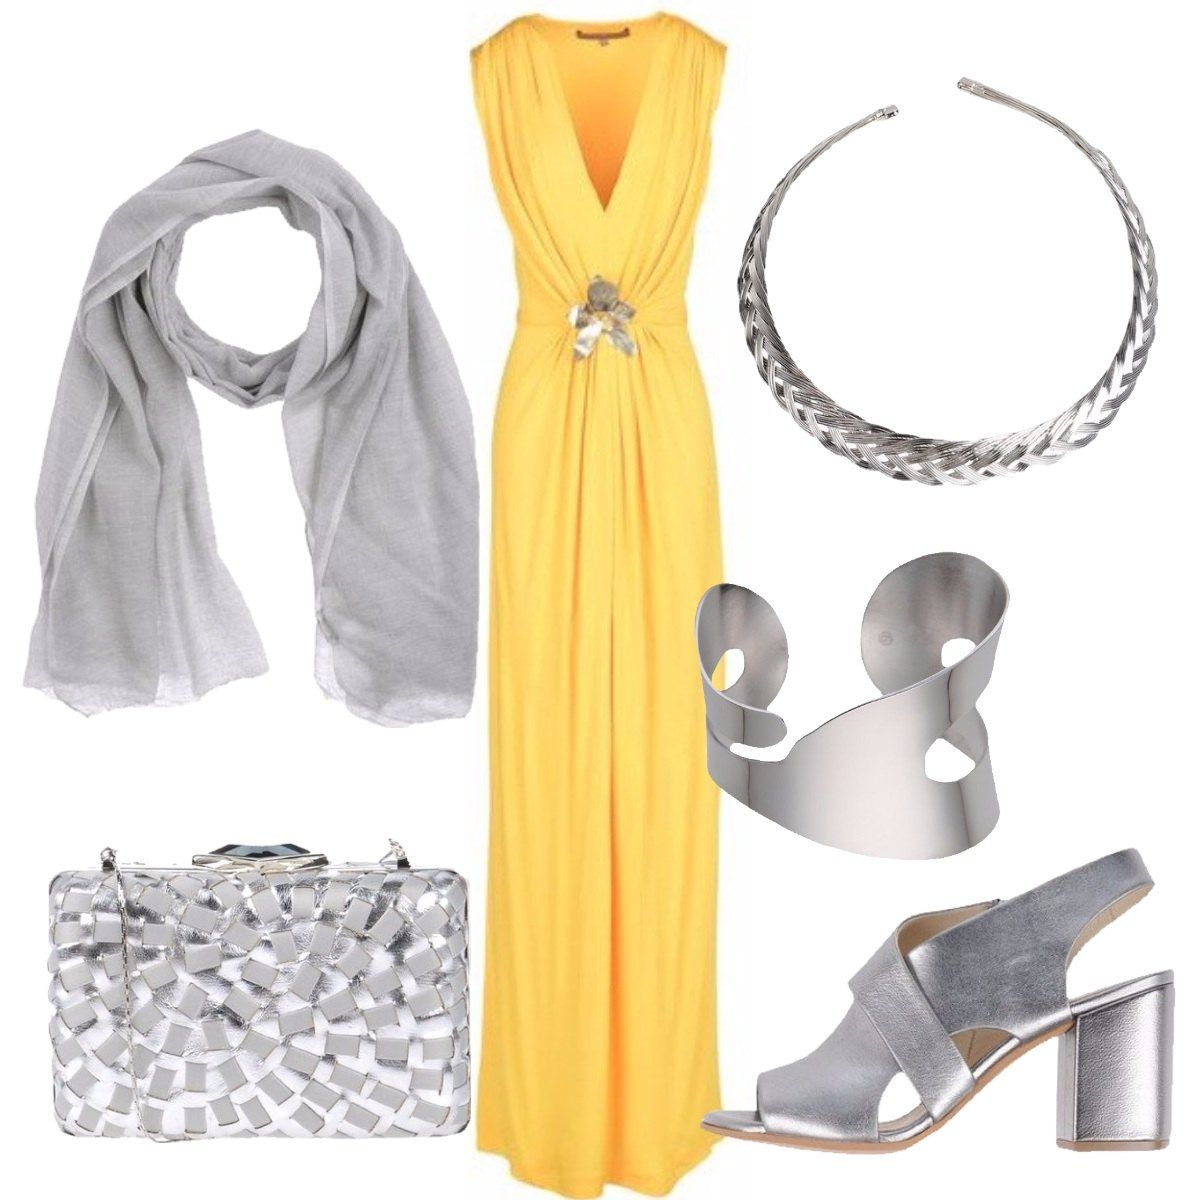 reputable site 5efd9 7c3e0 Pin su Outfit donna